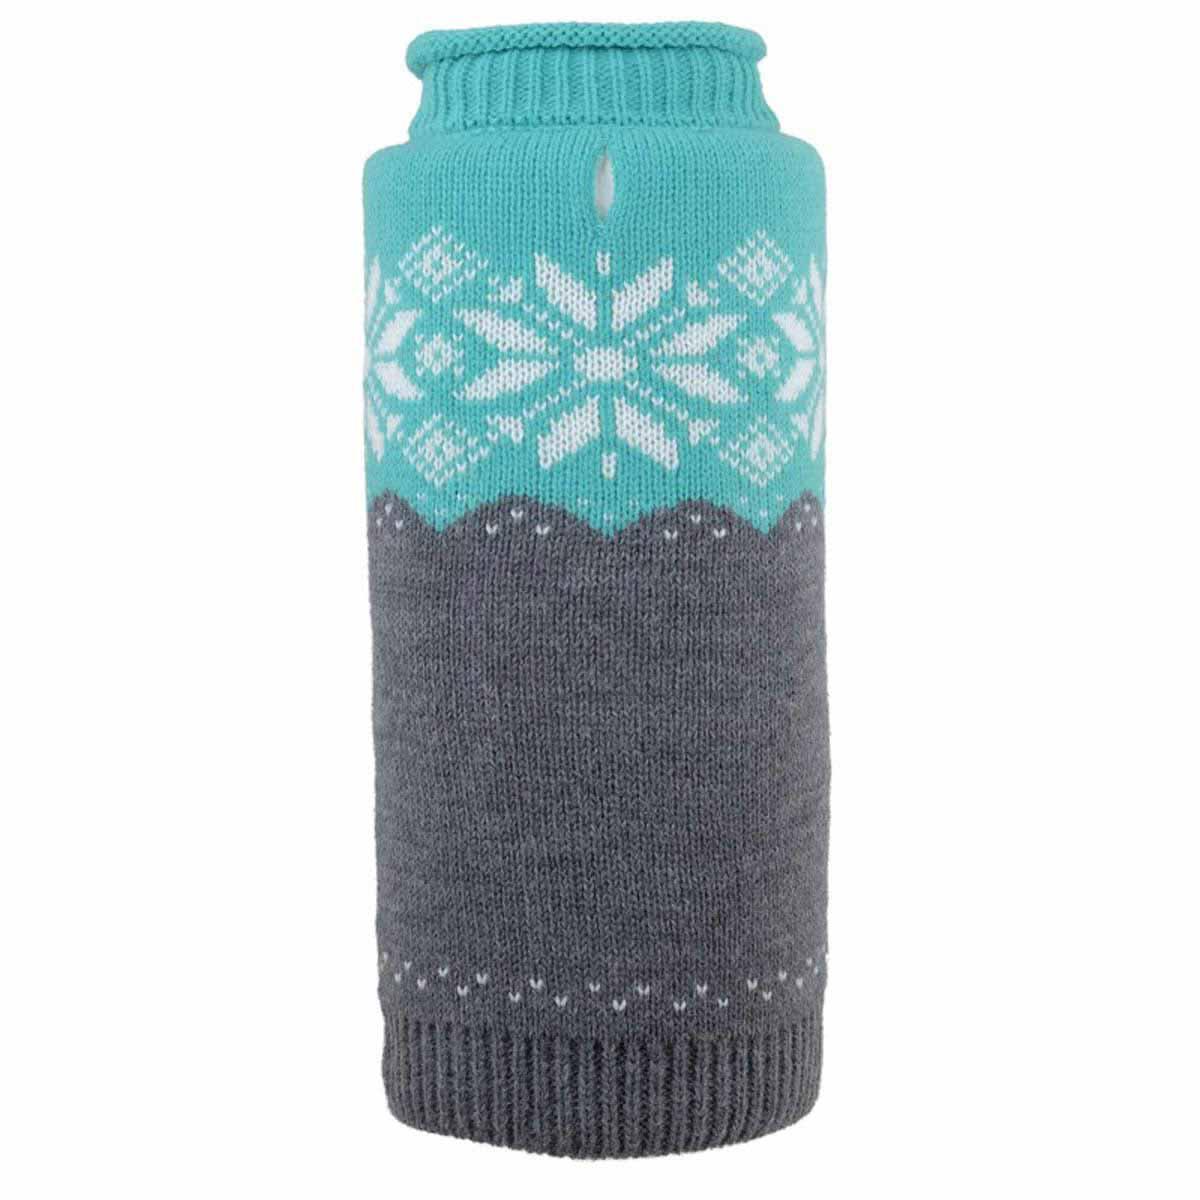 Worthy Dog Ski Lodge Dog Sweater - Teal